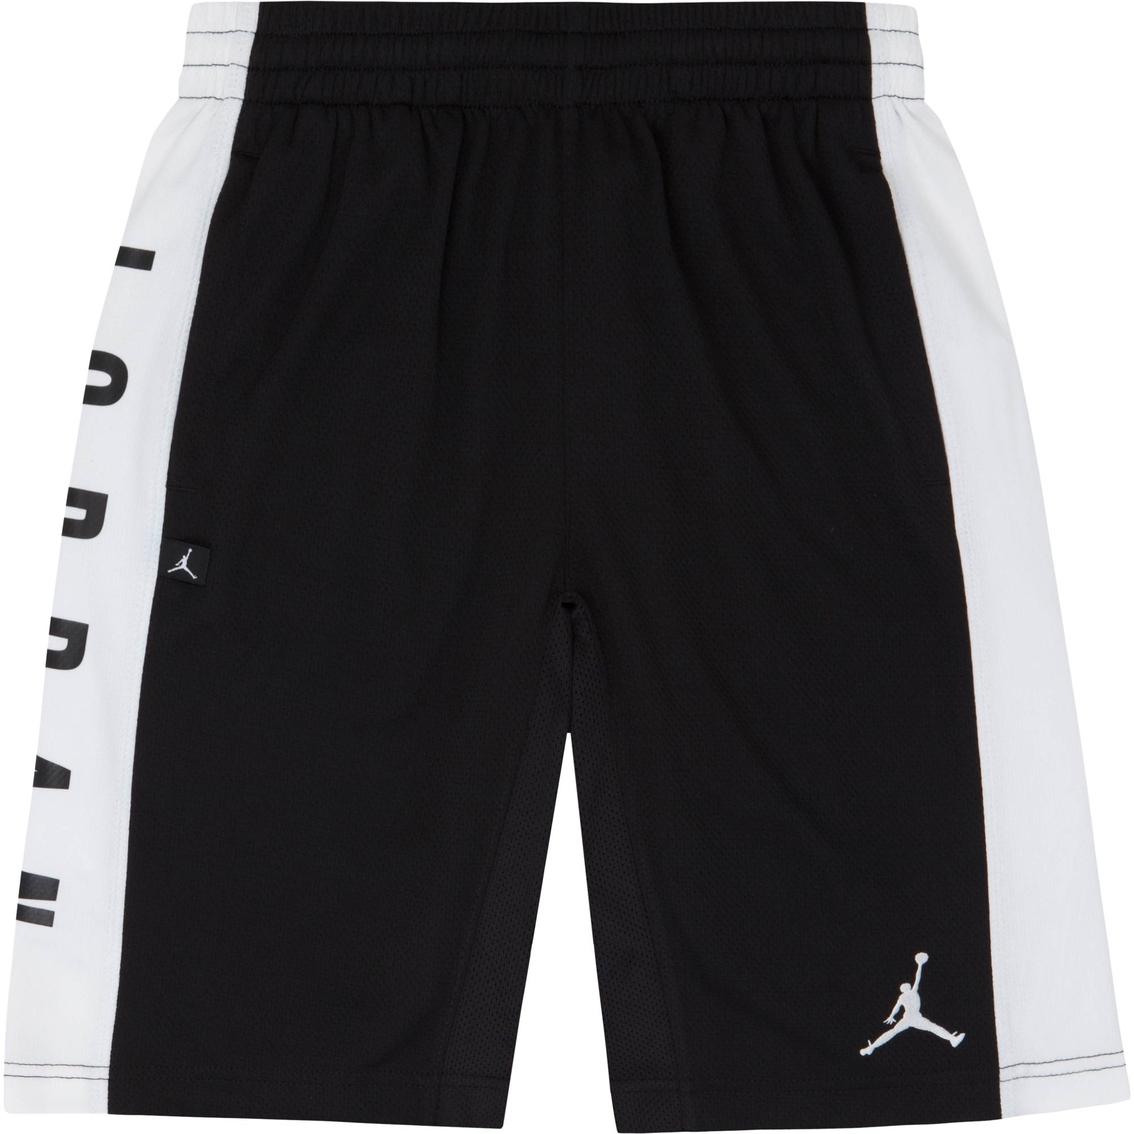 ed079994844 Air Jordan Boys Highlight Shorts | Boys 8-20 | Apparel | Shop The ...